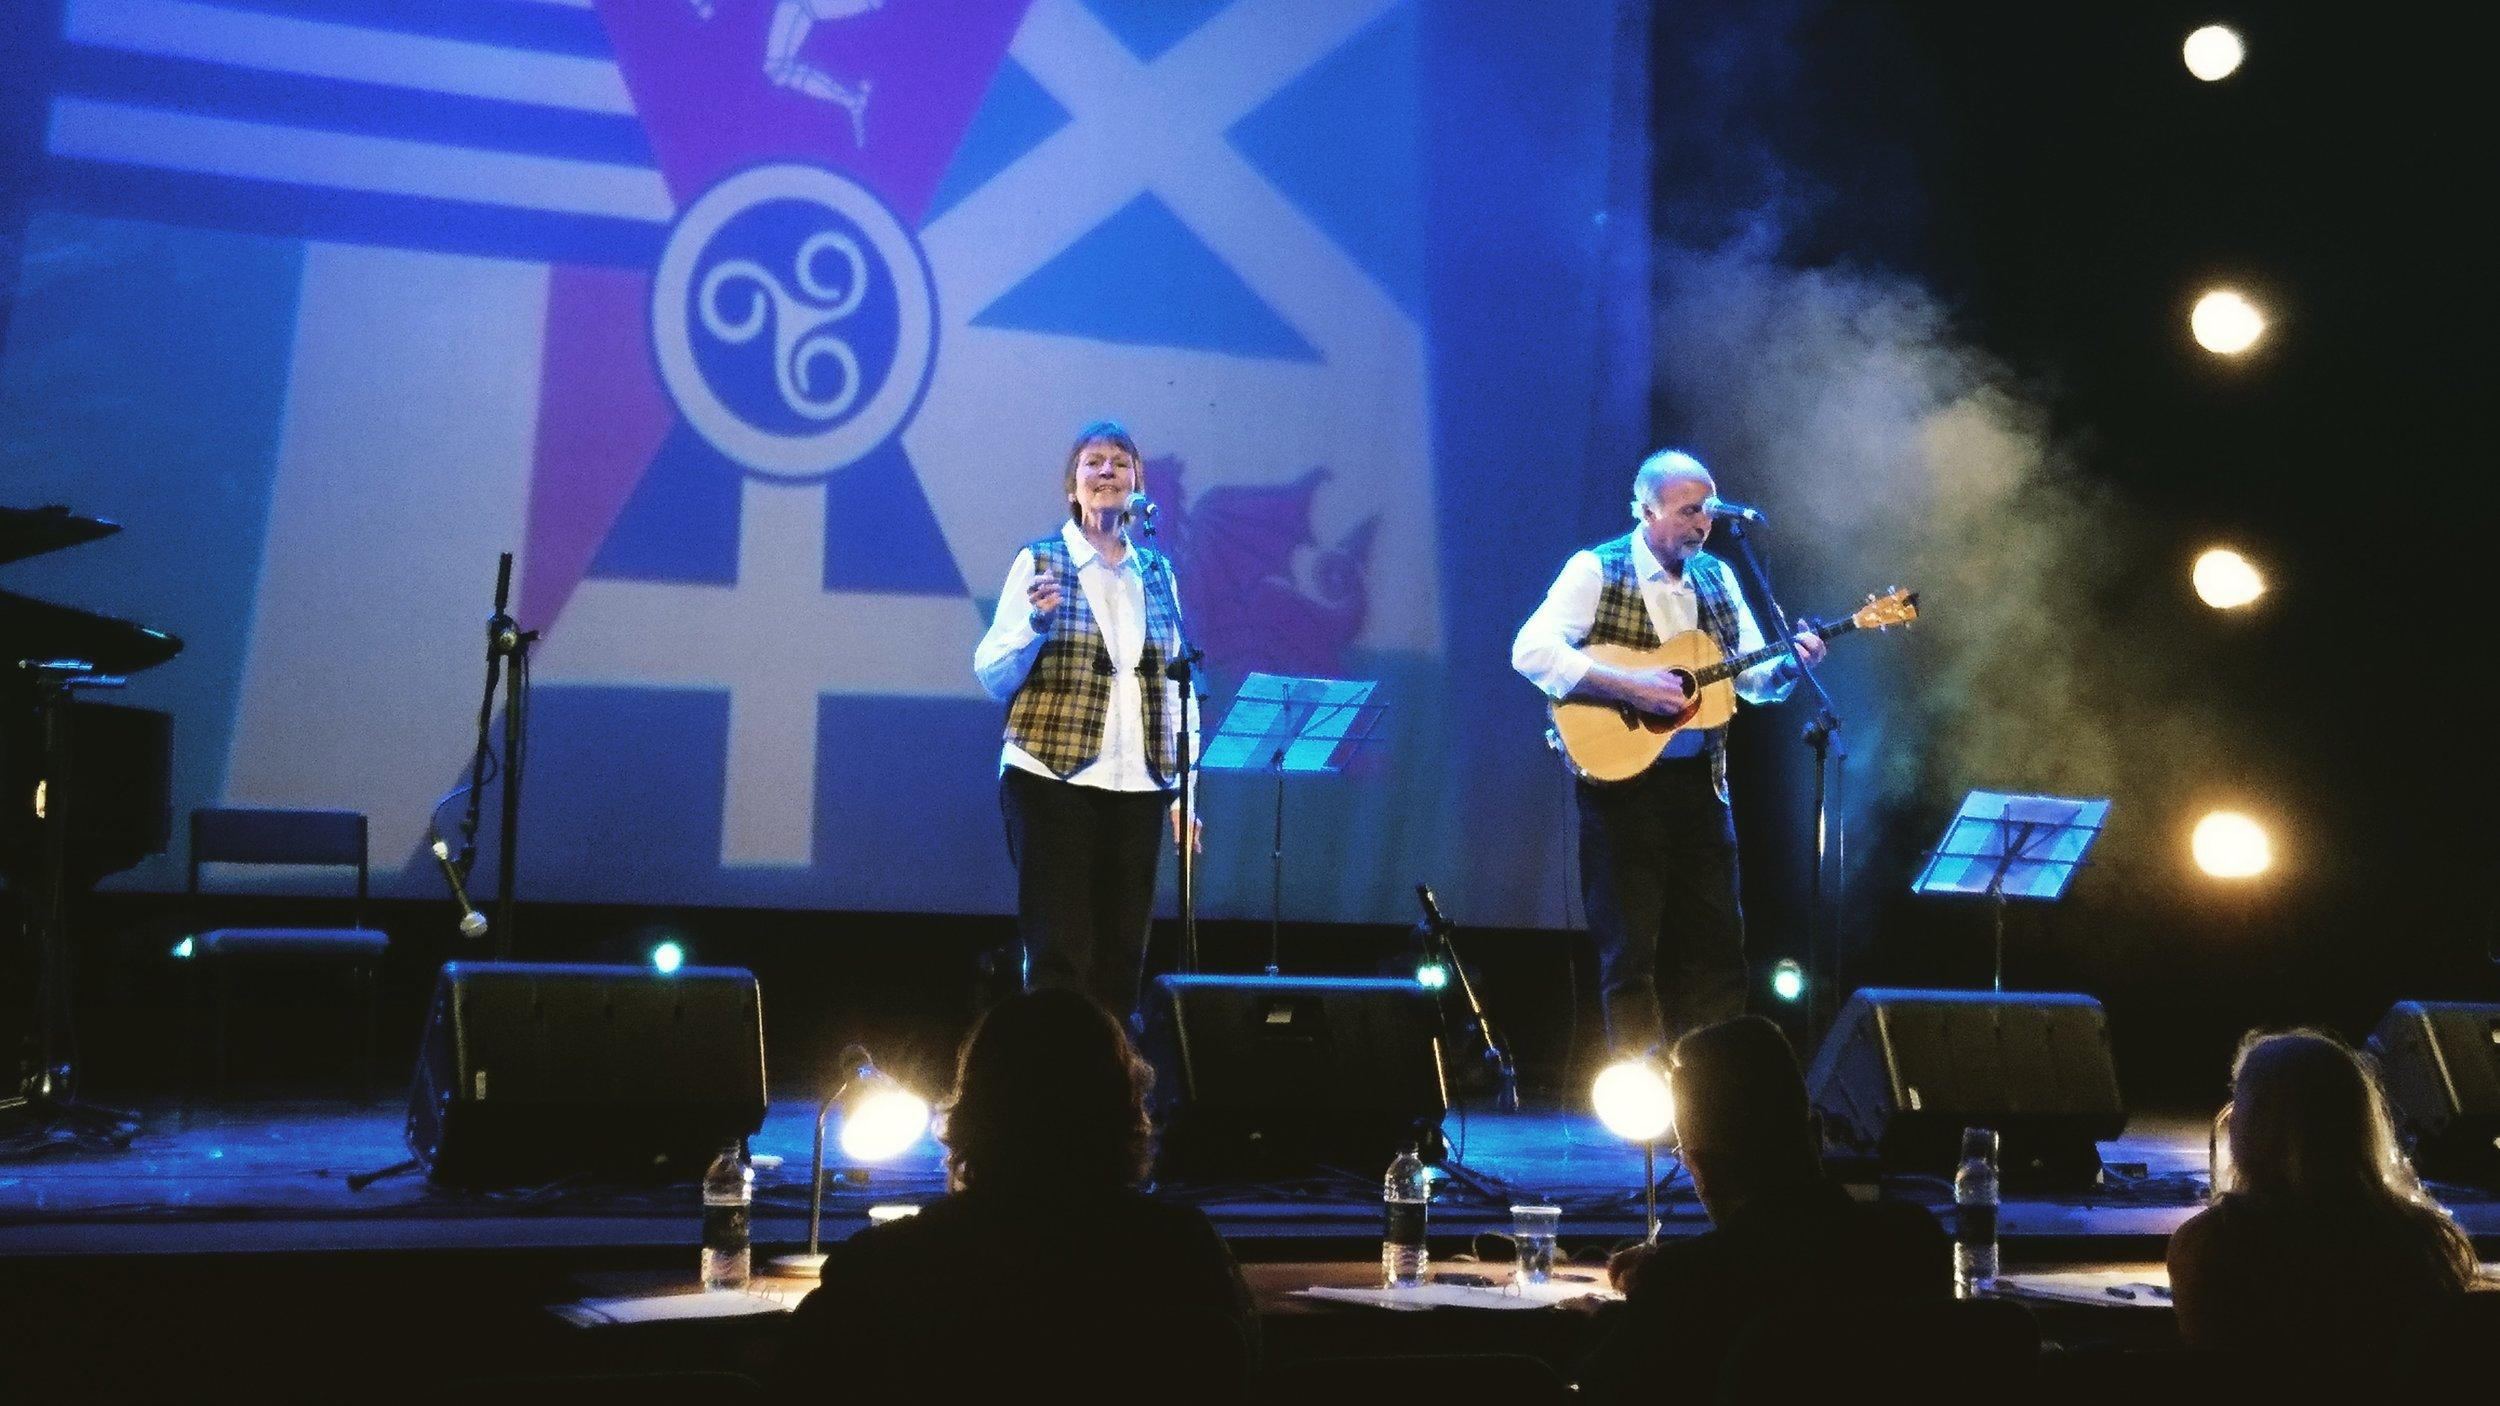 Tir ha Tavas - Deliah and Dave Brotherton